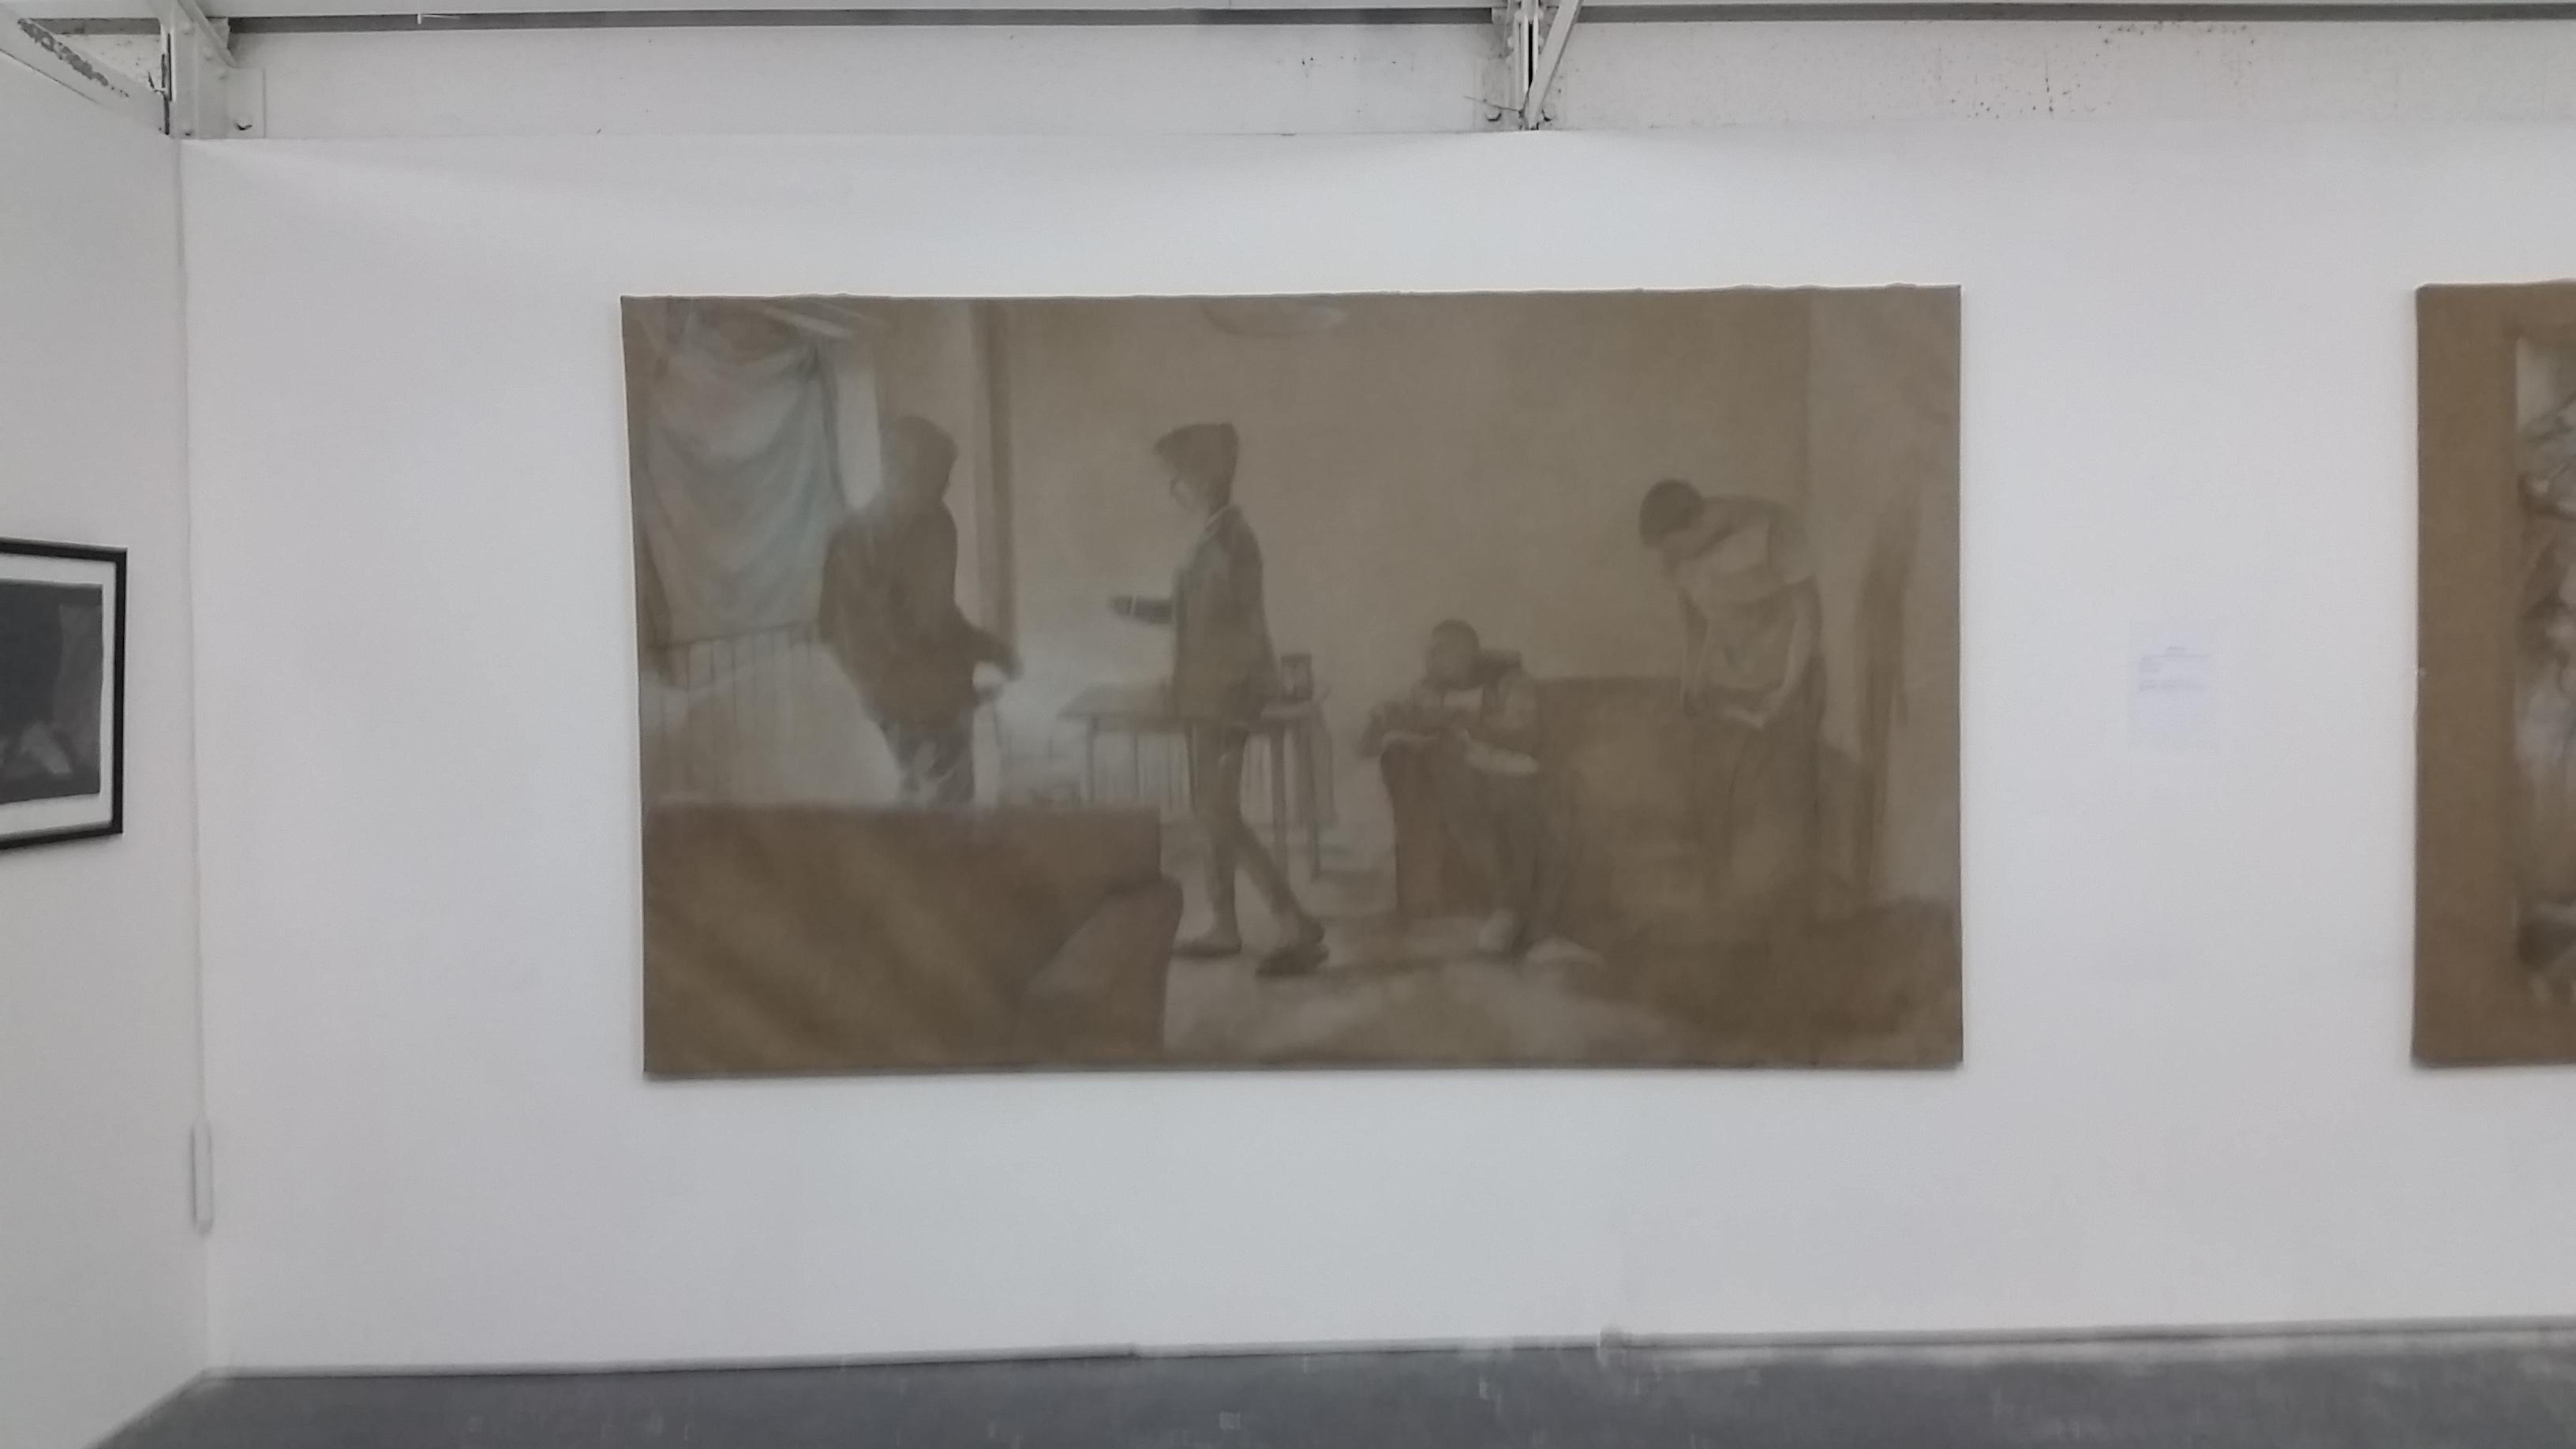 Sensei gallery 1